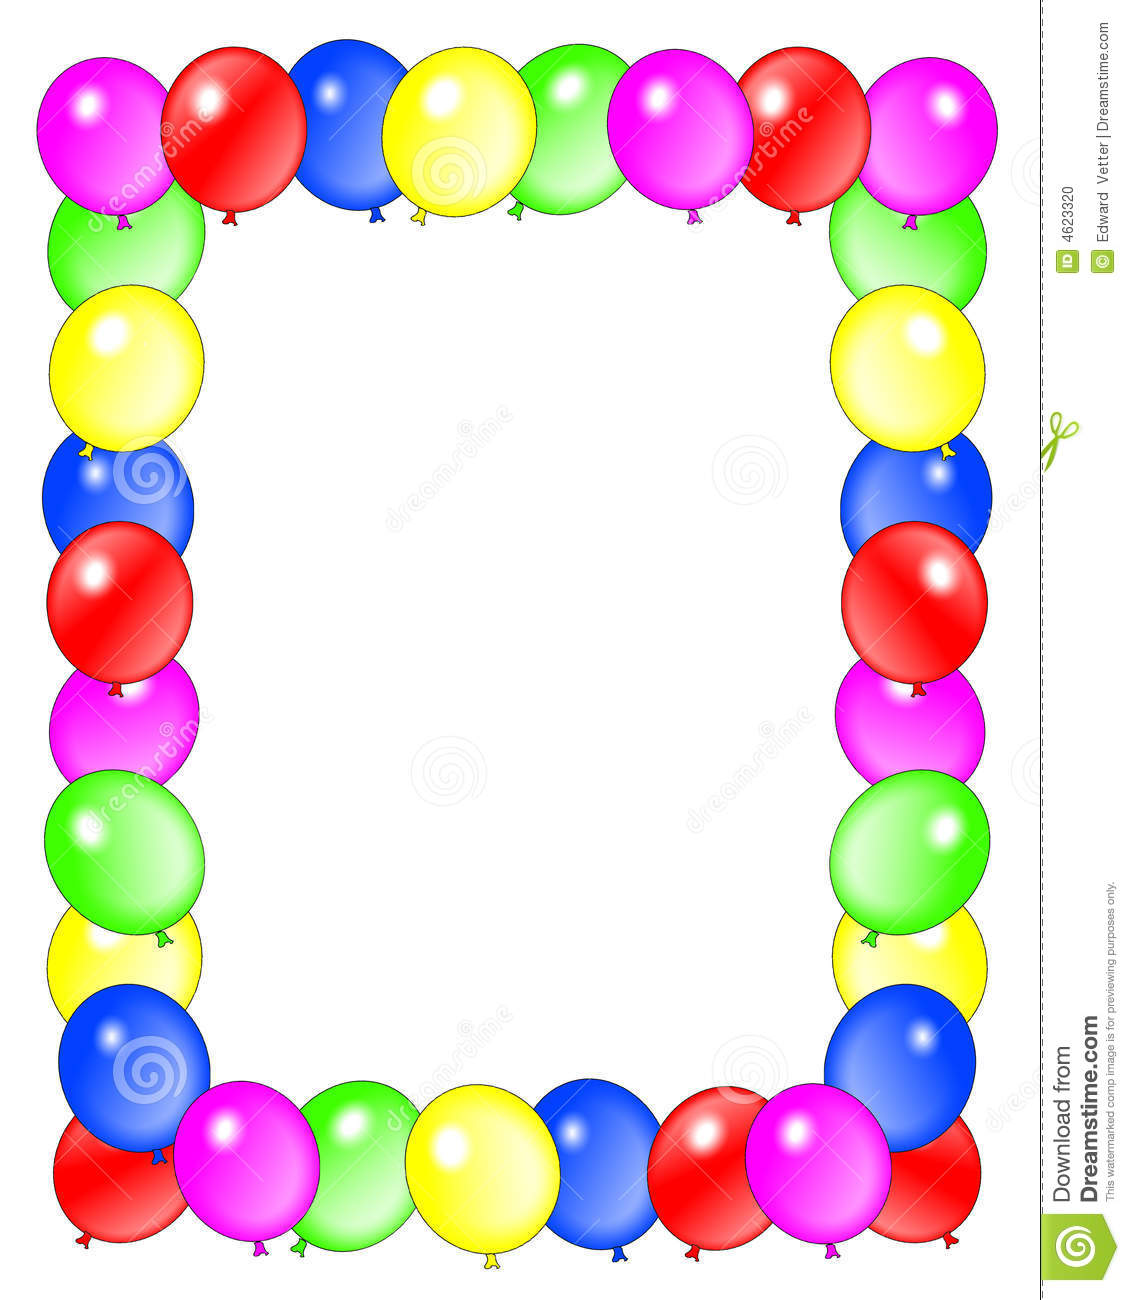 birthday clip art borders-birthday clip art borders-2